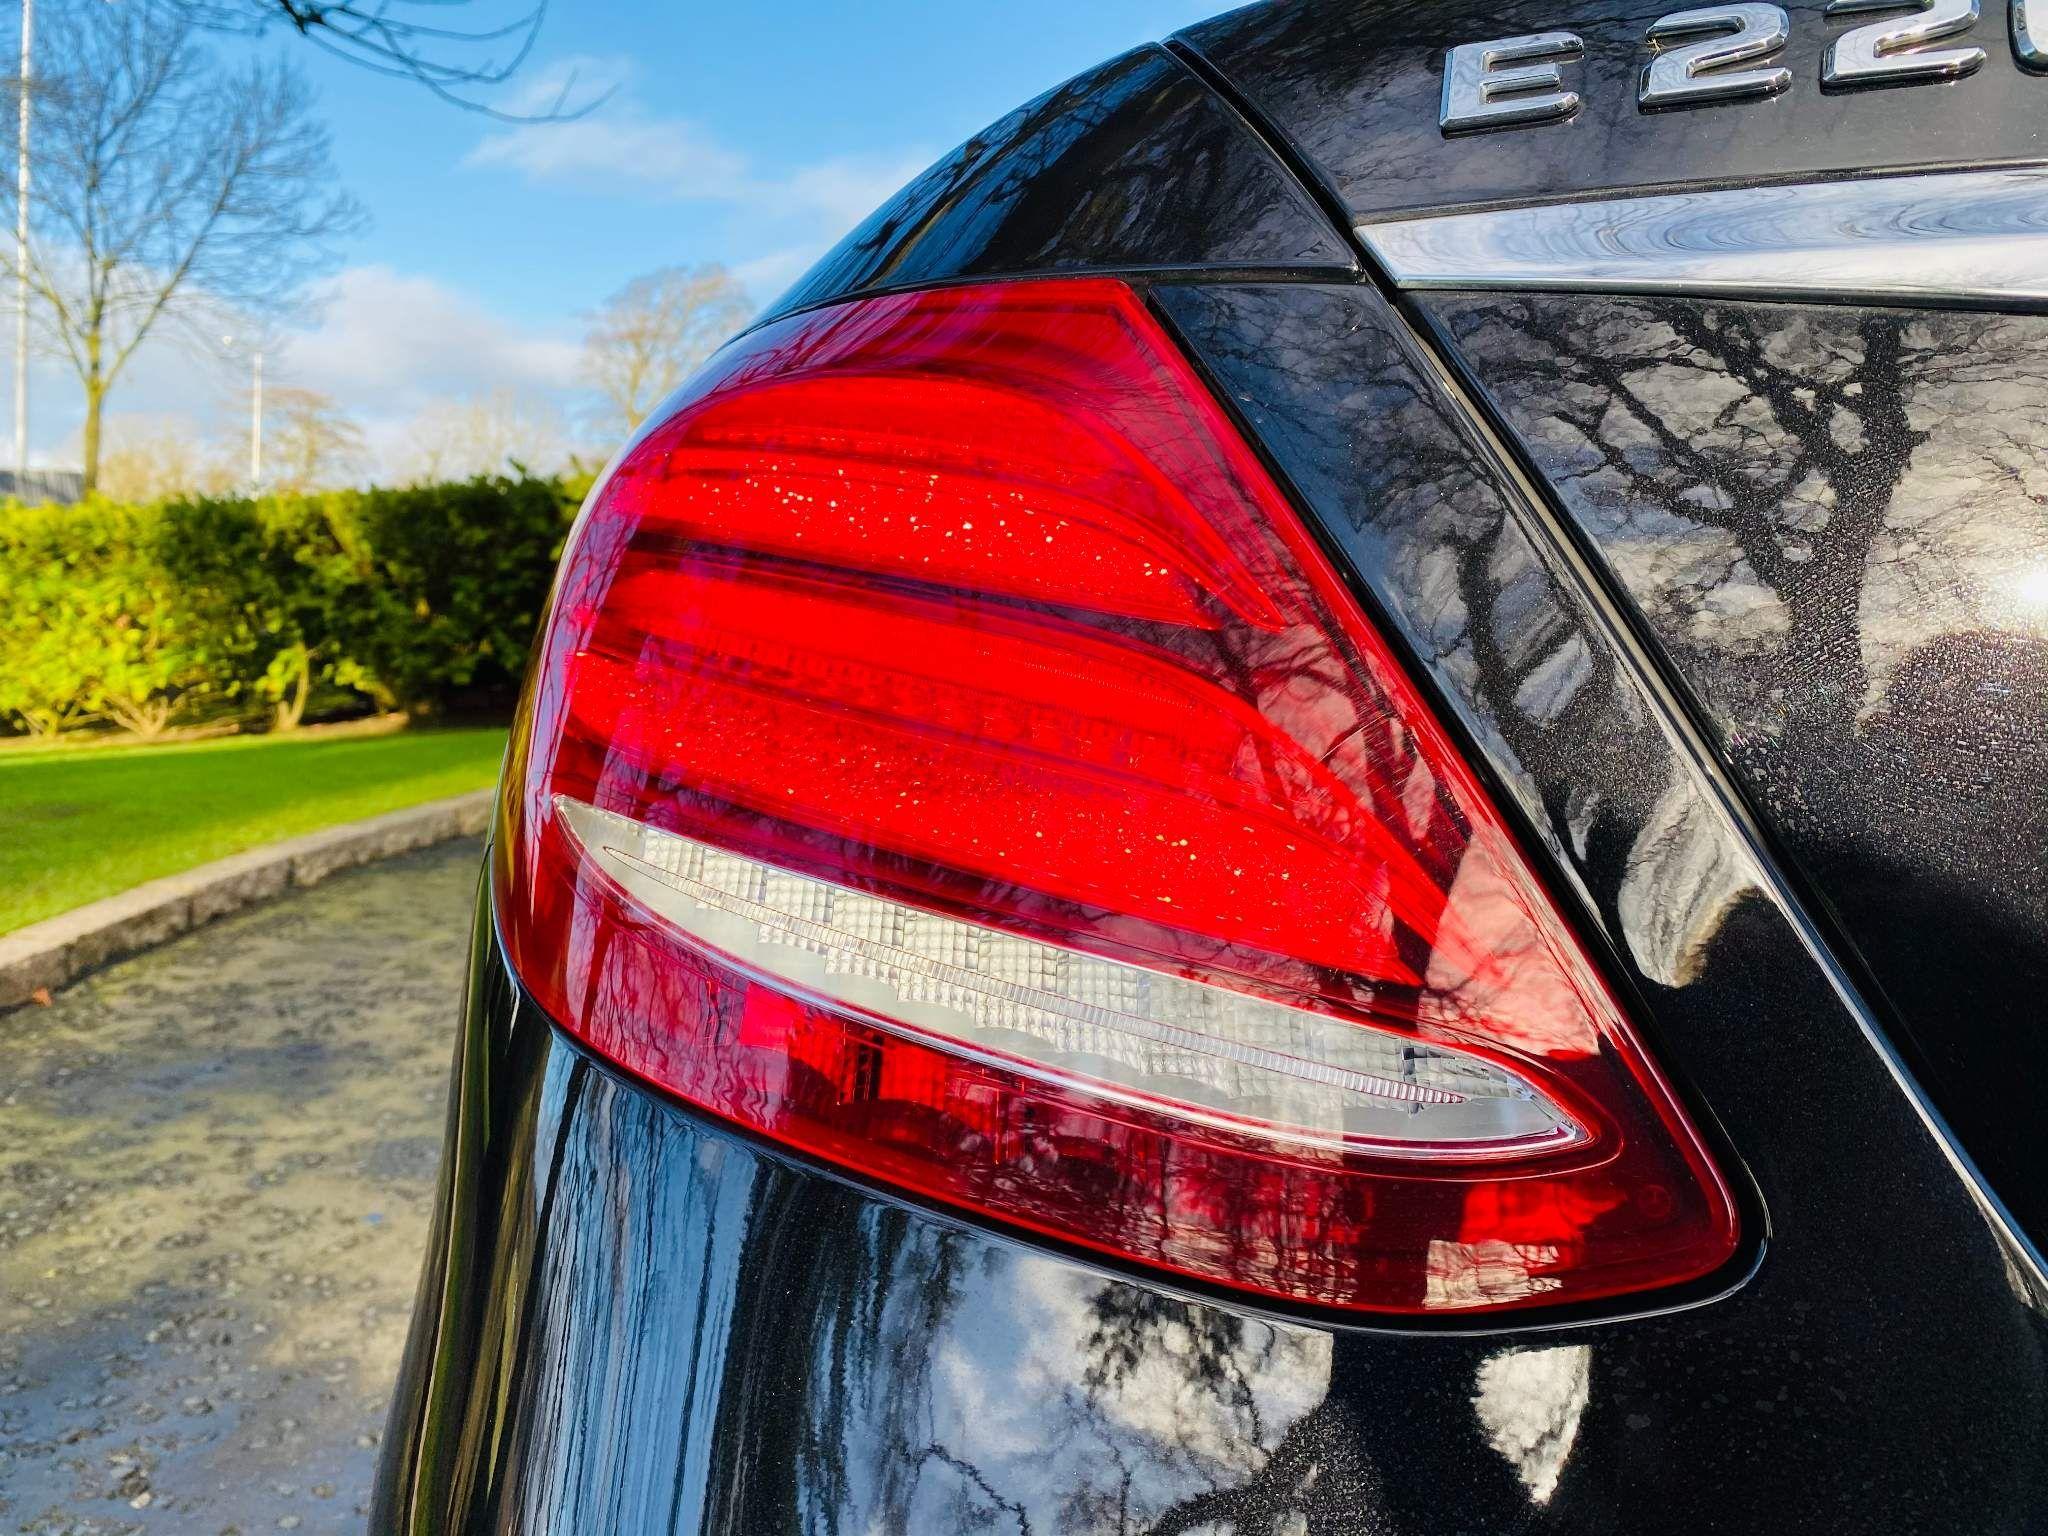 2018 Mercedes-Benz E Class 2.0 E220d AMG Line G-Tronic+ (s/s) 4dr Diesel Automatic – Moyway Motors Dungannon full